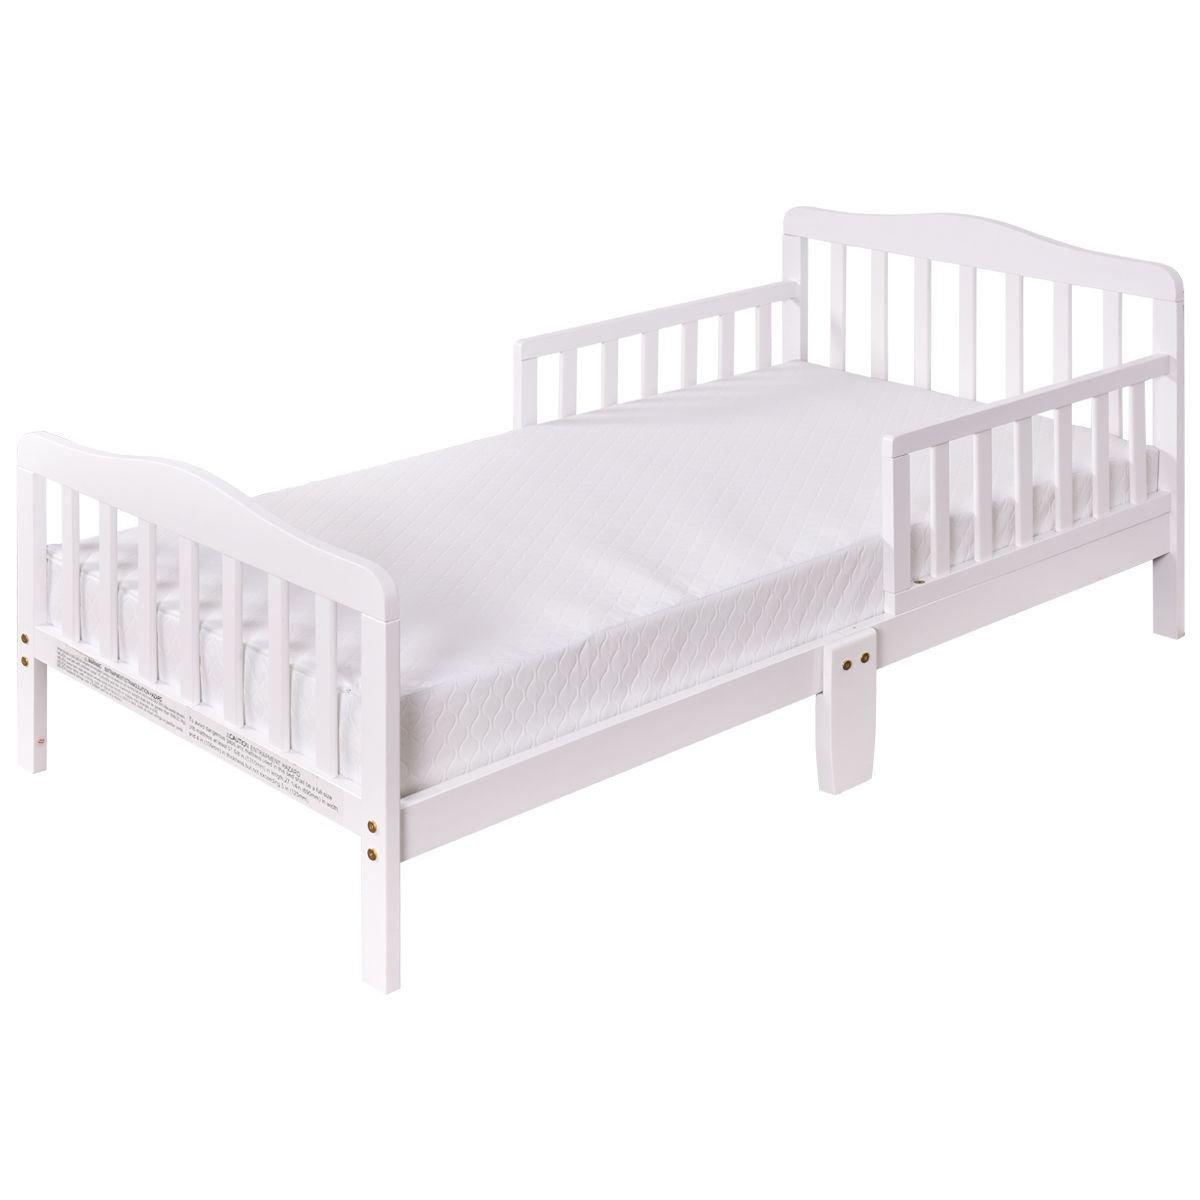 Baby Toddler Bed Kids Chirldren Wood Bedroom Furniture w/ Safety Rails White